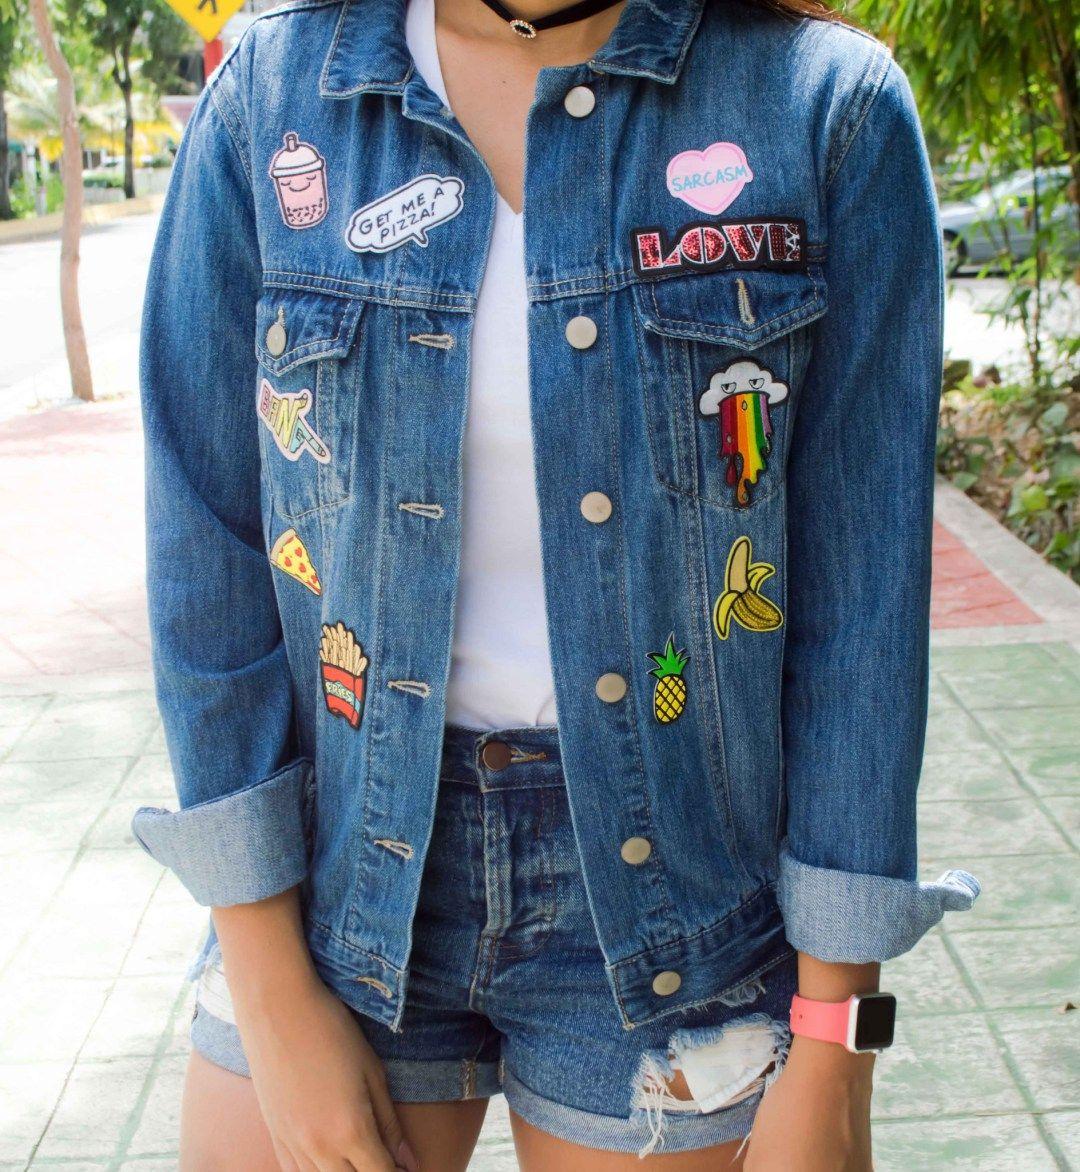 Clothes Chaqueta Pinterest Denim Parches Y pYw7qa